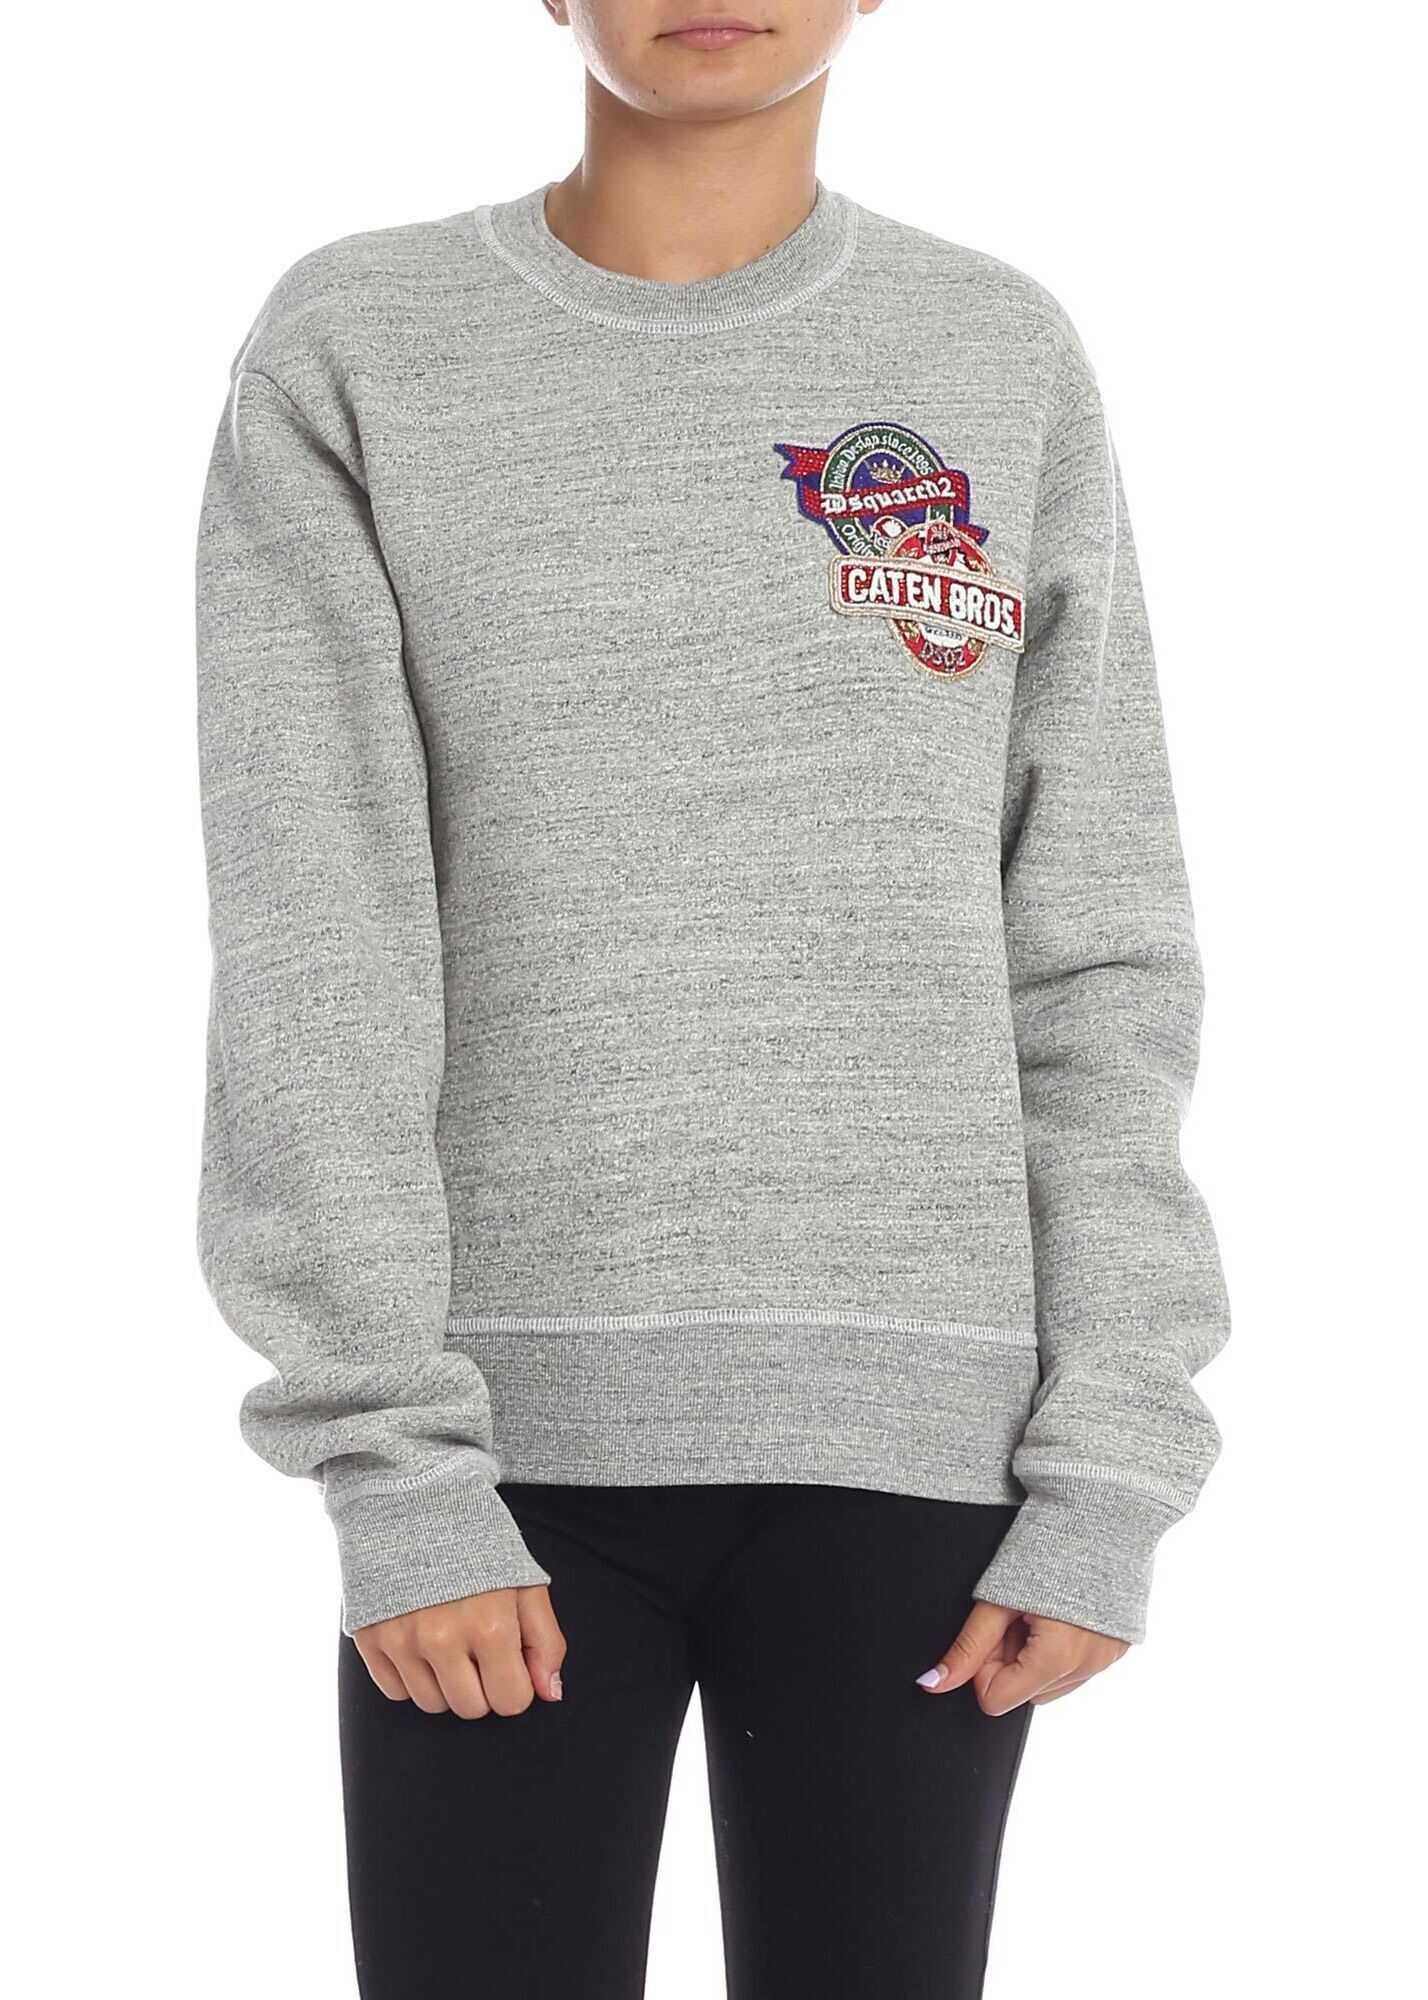 DSQUARED2 Cotton Sweatshirt GREY